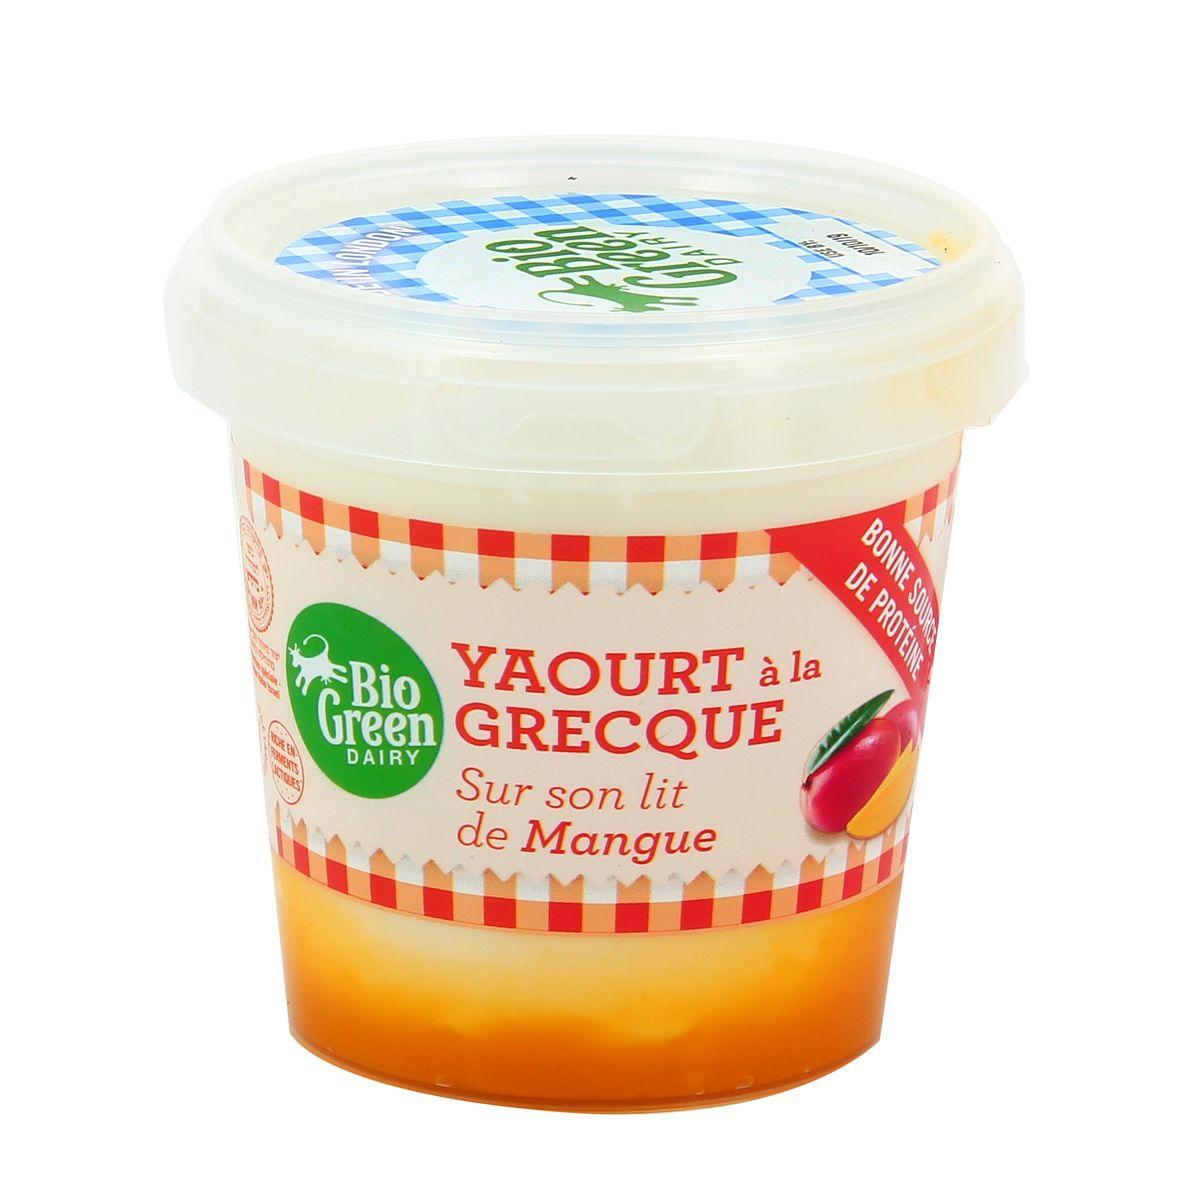 Yaourt mangue à la Grecque, Bio Green Dairy (170 g)